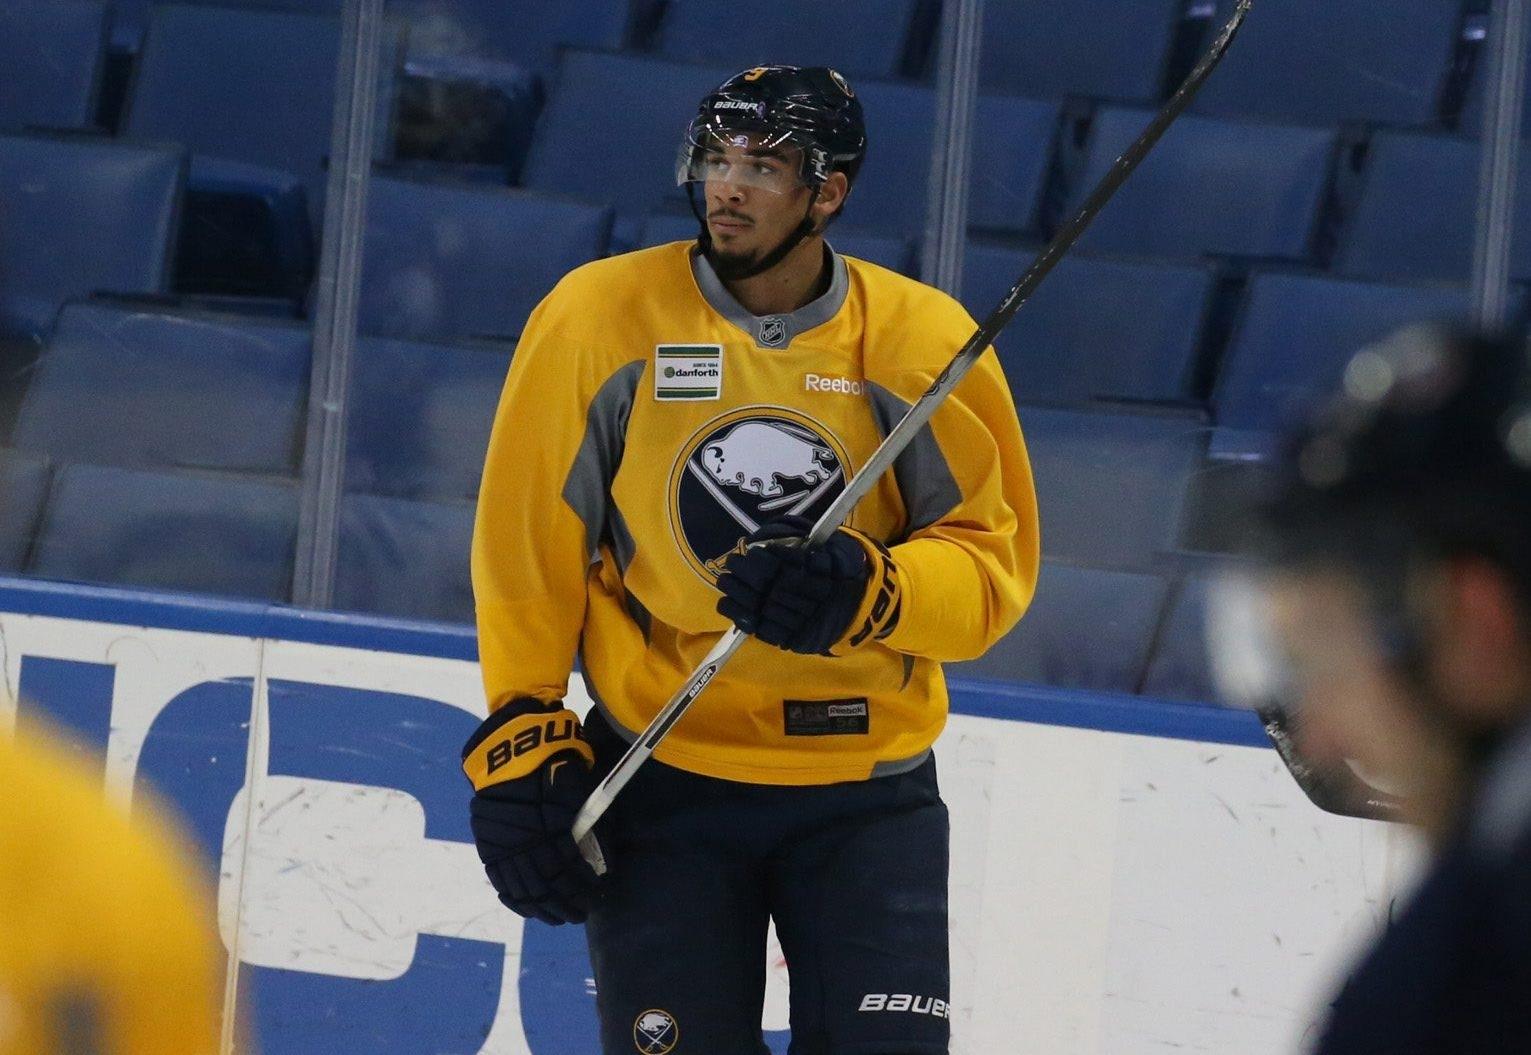 Evander Kane practices with the Sabres Monday morning at the First Niagara Center. (John Hickey/Buffalo News)